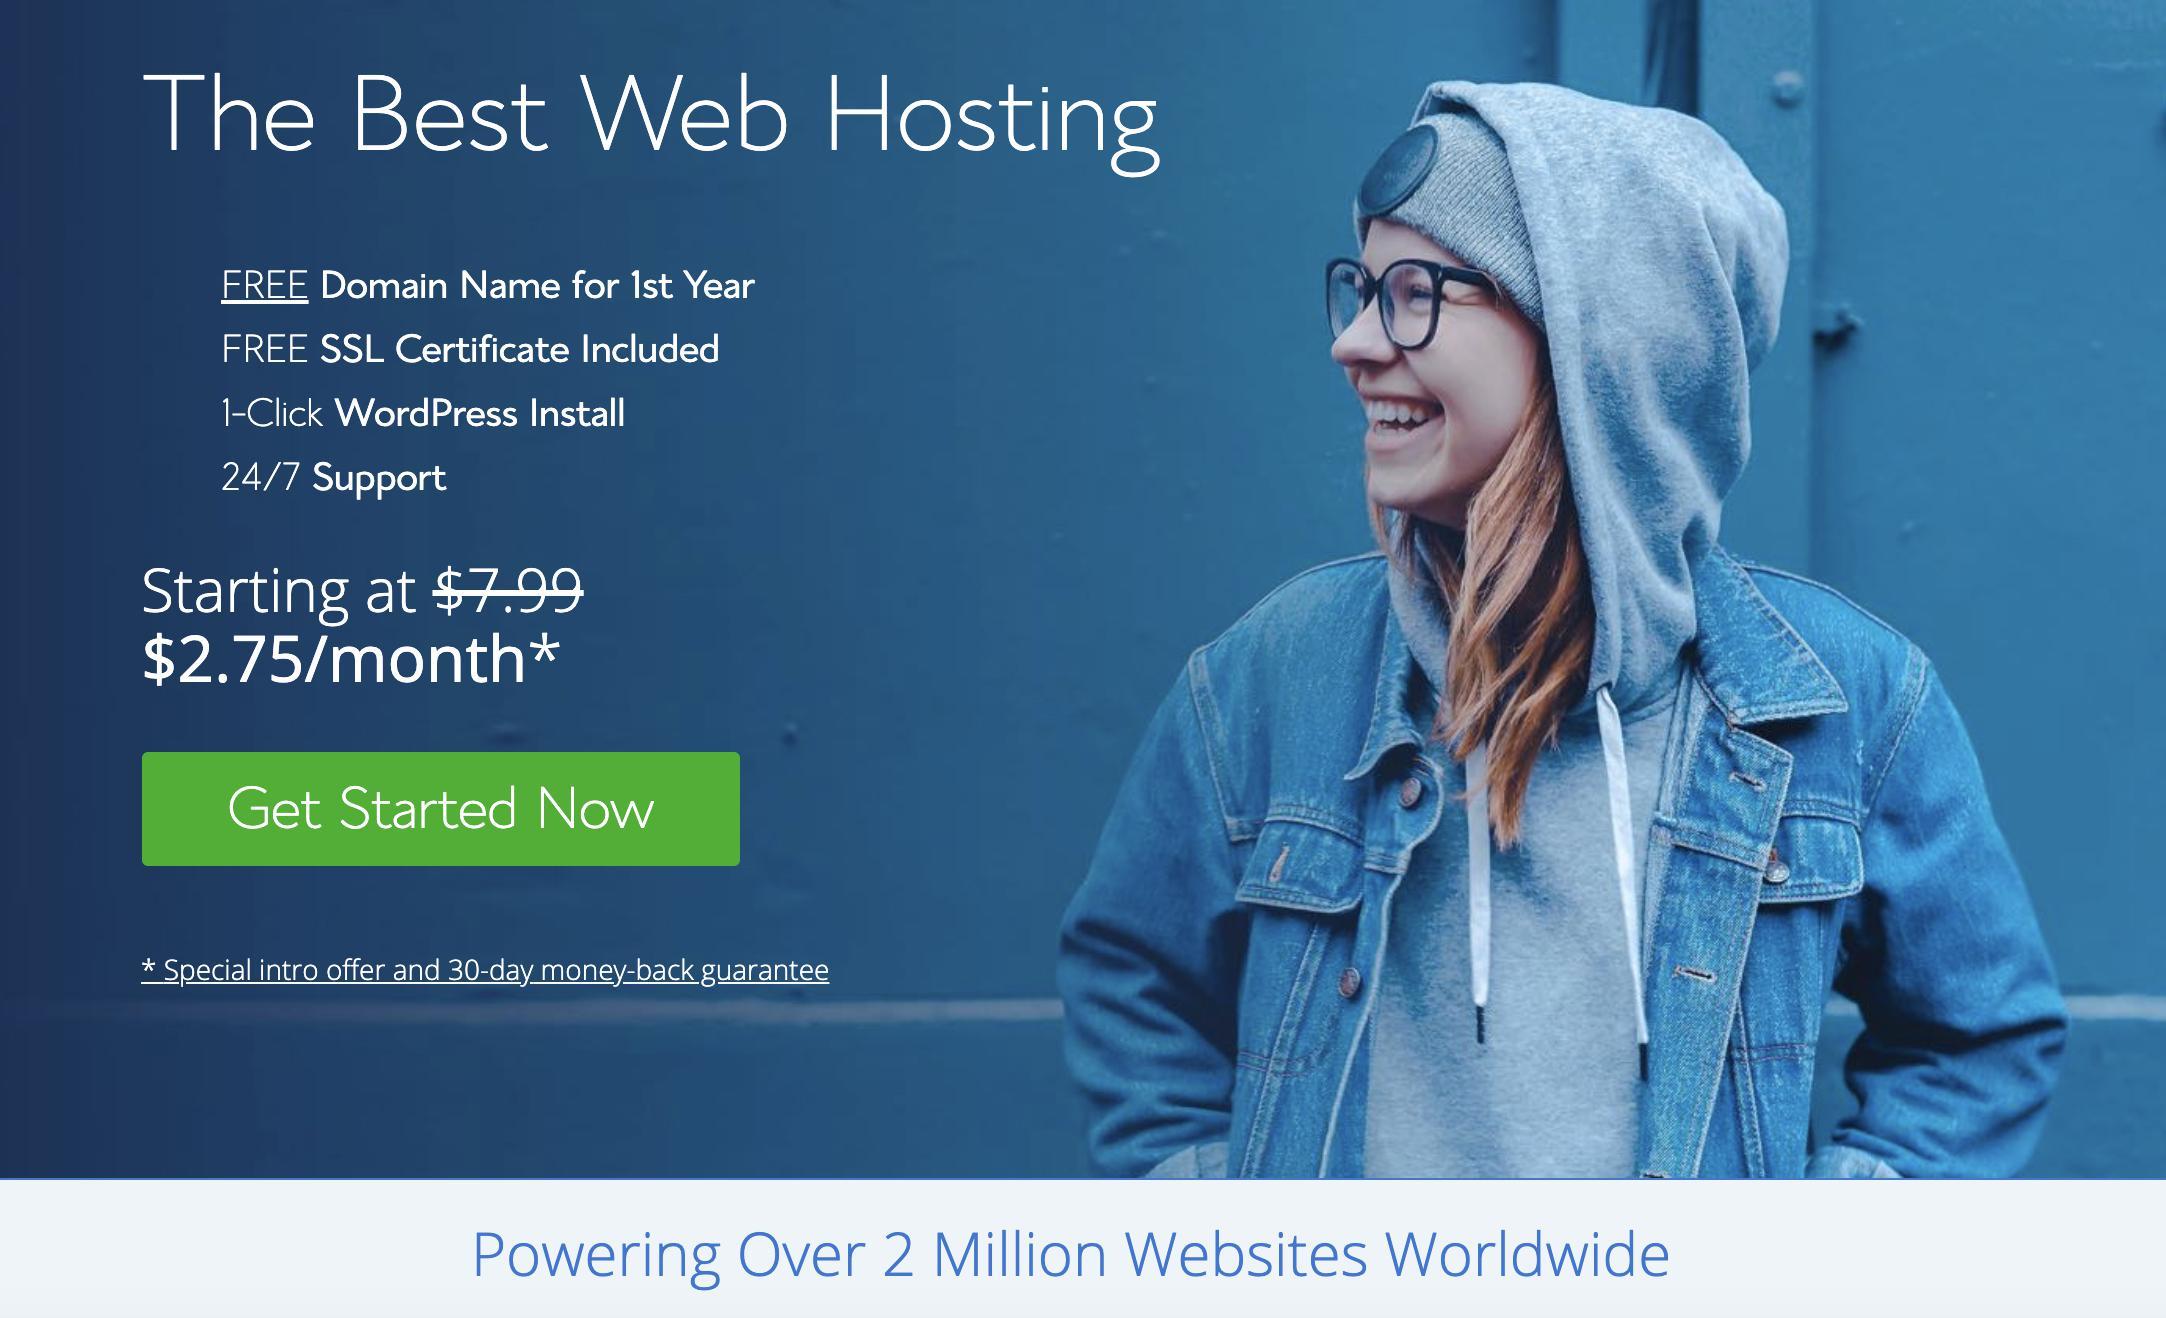 Как перенести LiveJournal на WordPress - Пошаговое руководство 2020